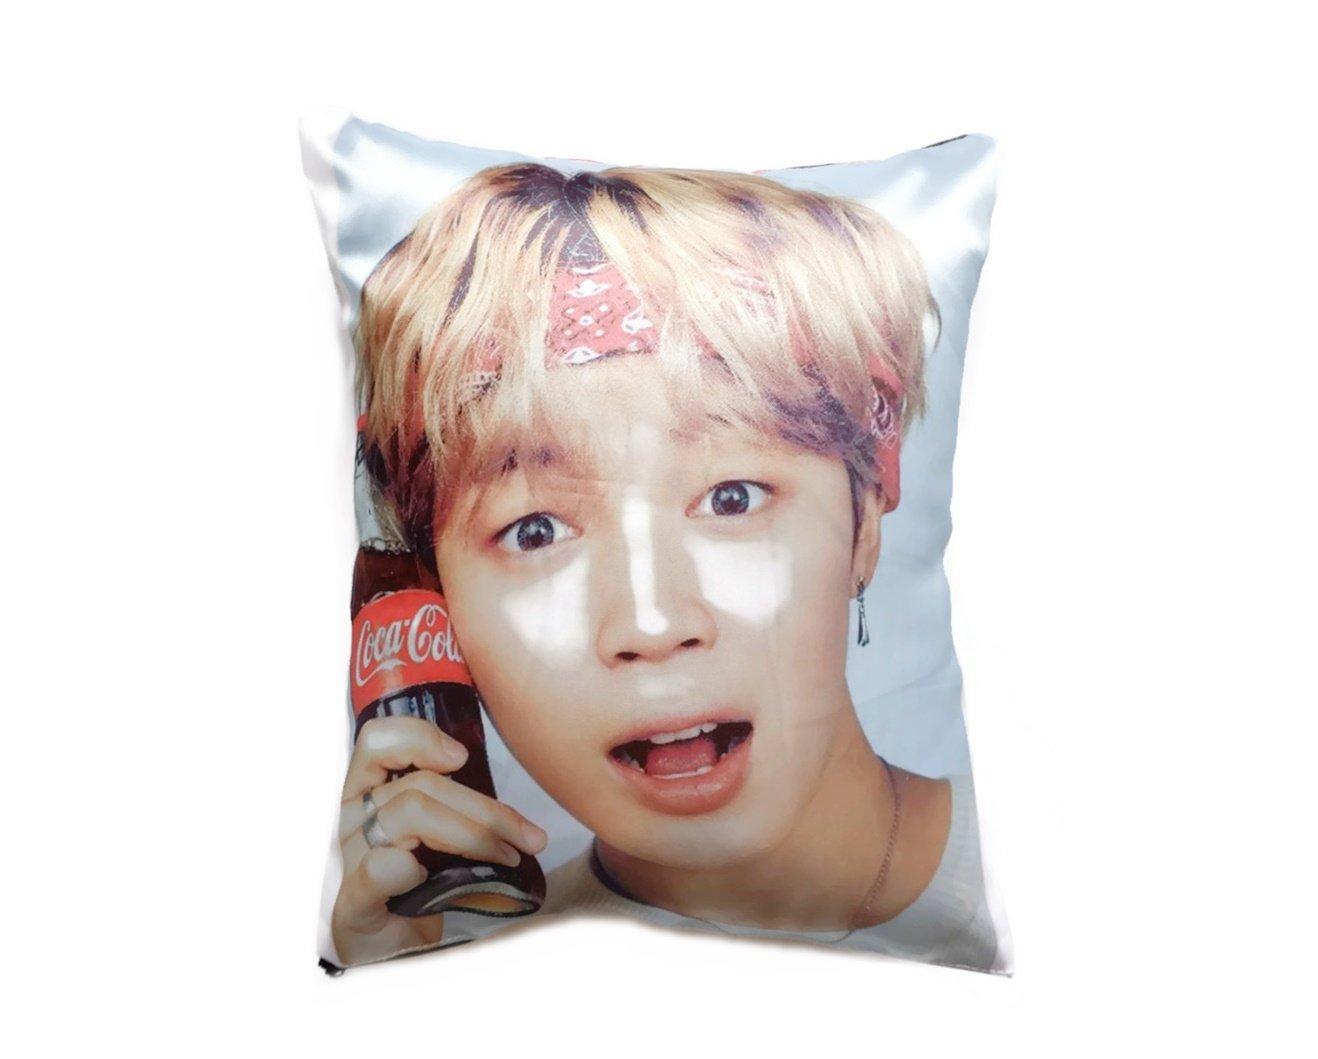 Park Jimin Bangtang Boys BTS Boy Band Kpop Pillowcase (#007)